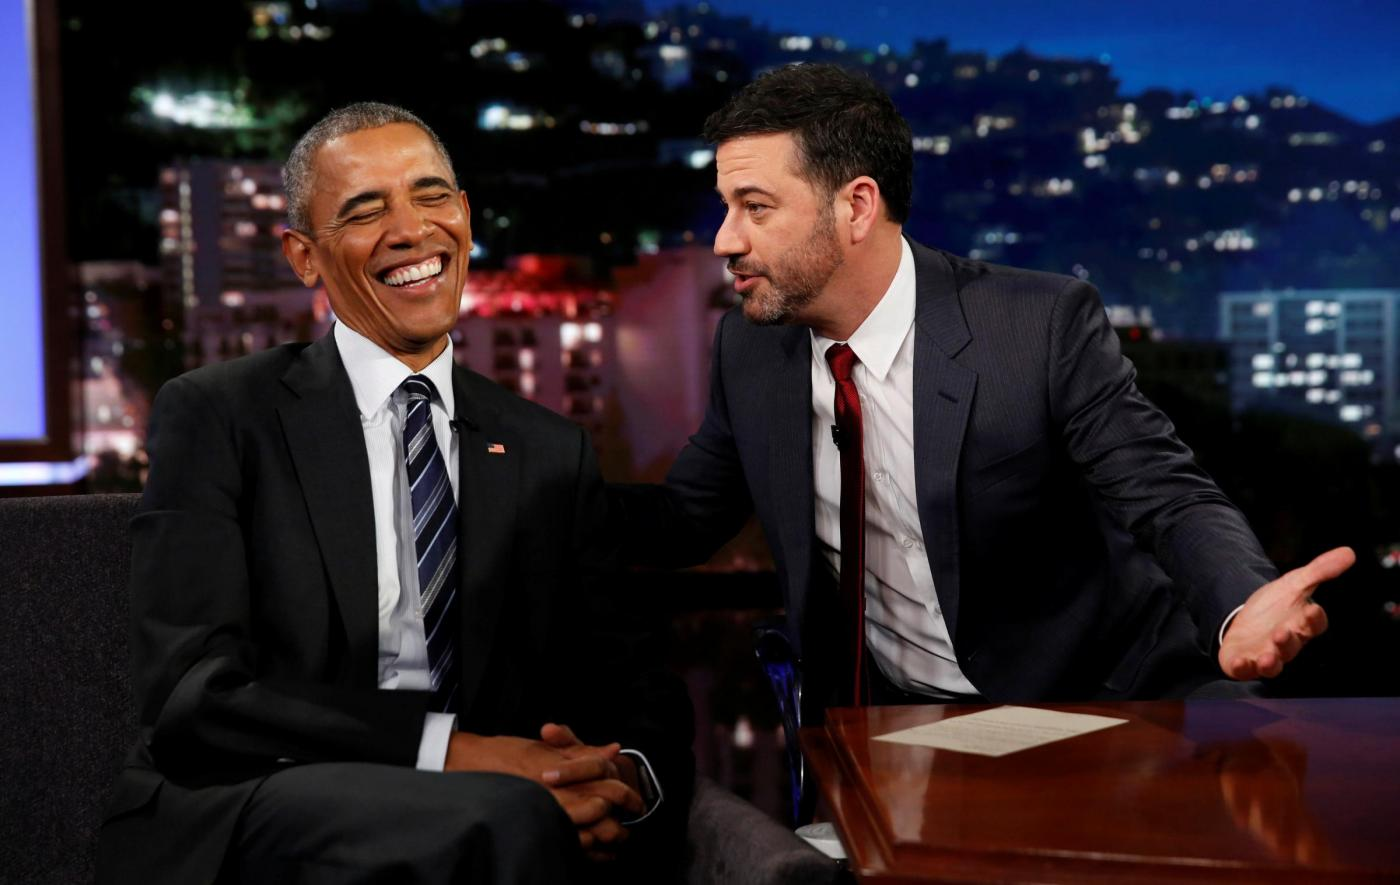 Los Angeles, il presidente Obama intervistato al Jimmy Kimmel Live!